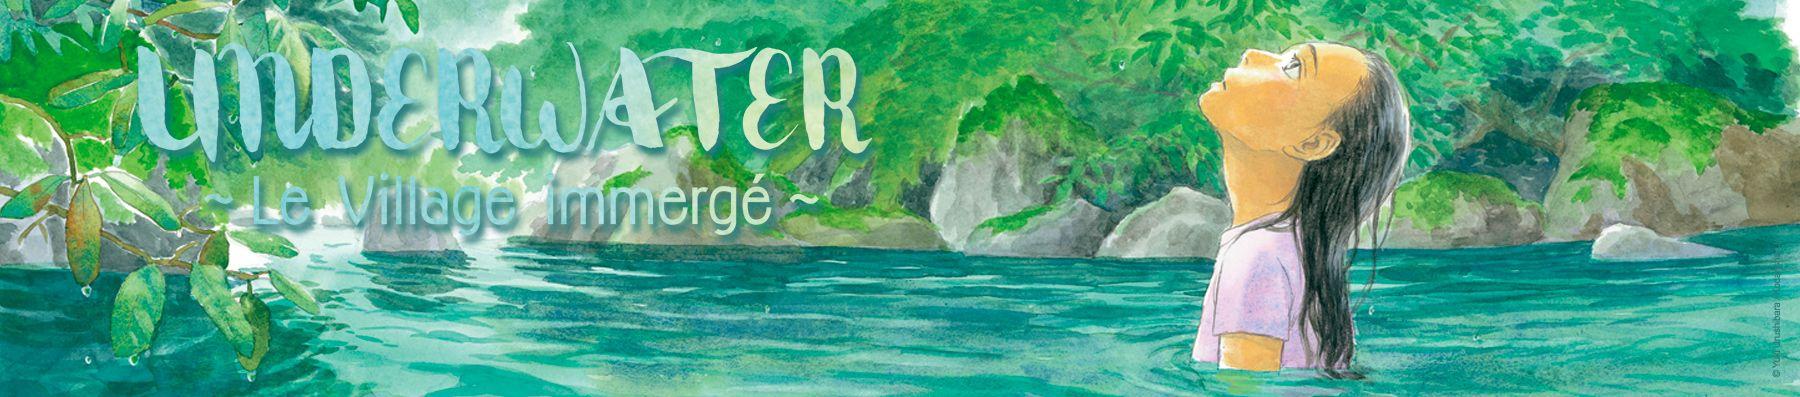 Dossier manga - Underwater - Le village immergé